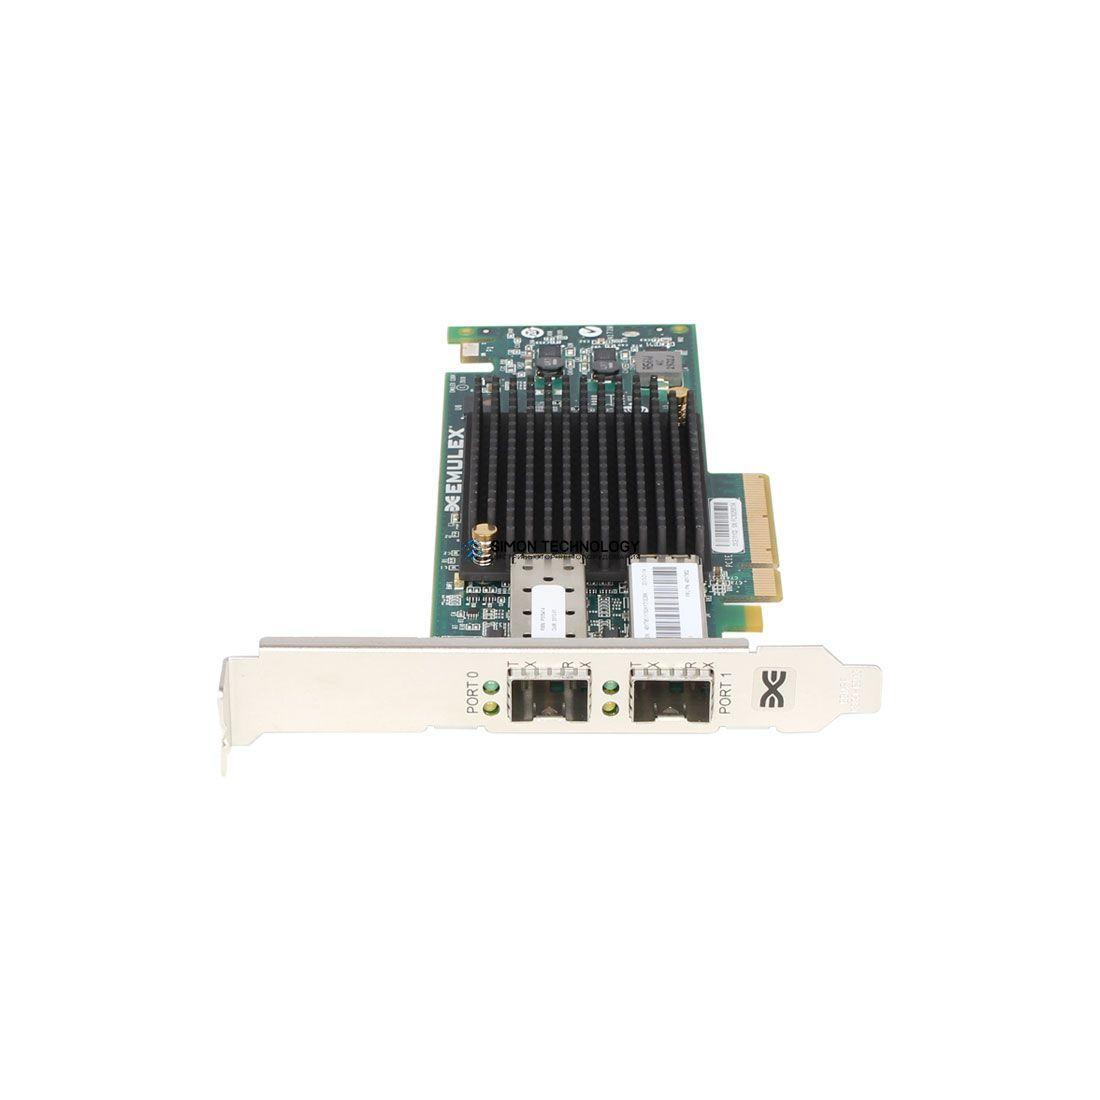 Контроллер IBM 10GB ETHERNET VIRTUAL FABRIC ADAPTER II - HIGH PROFILE (49Y7951-HP)